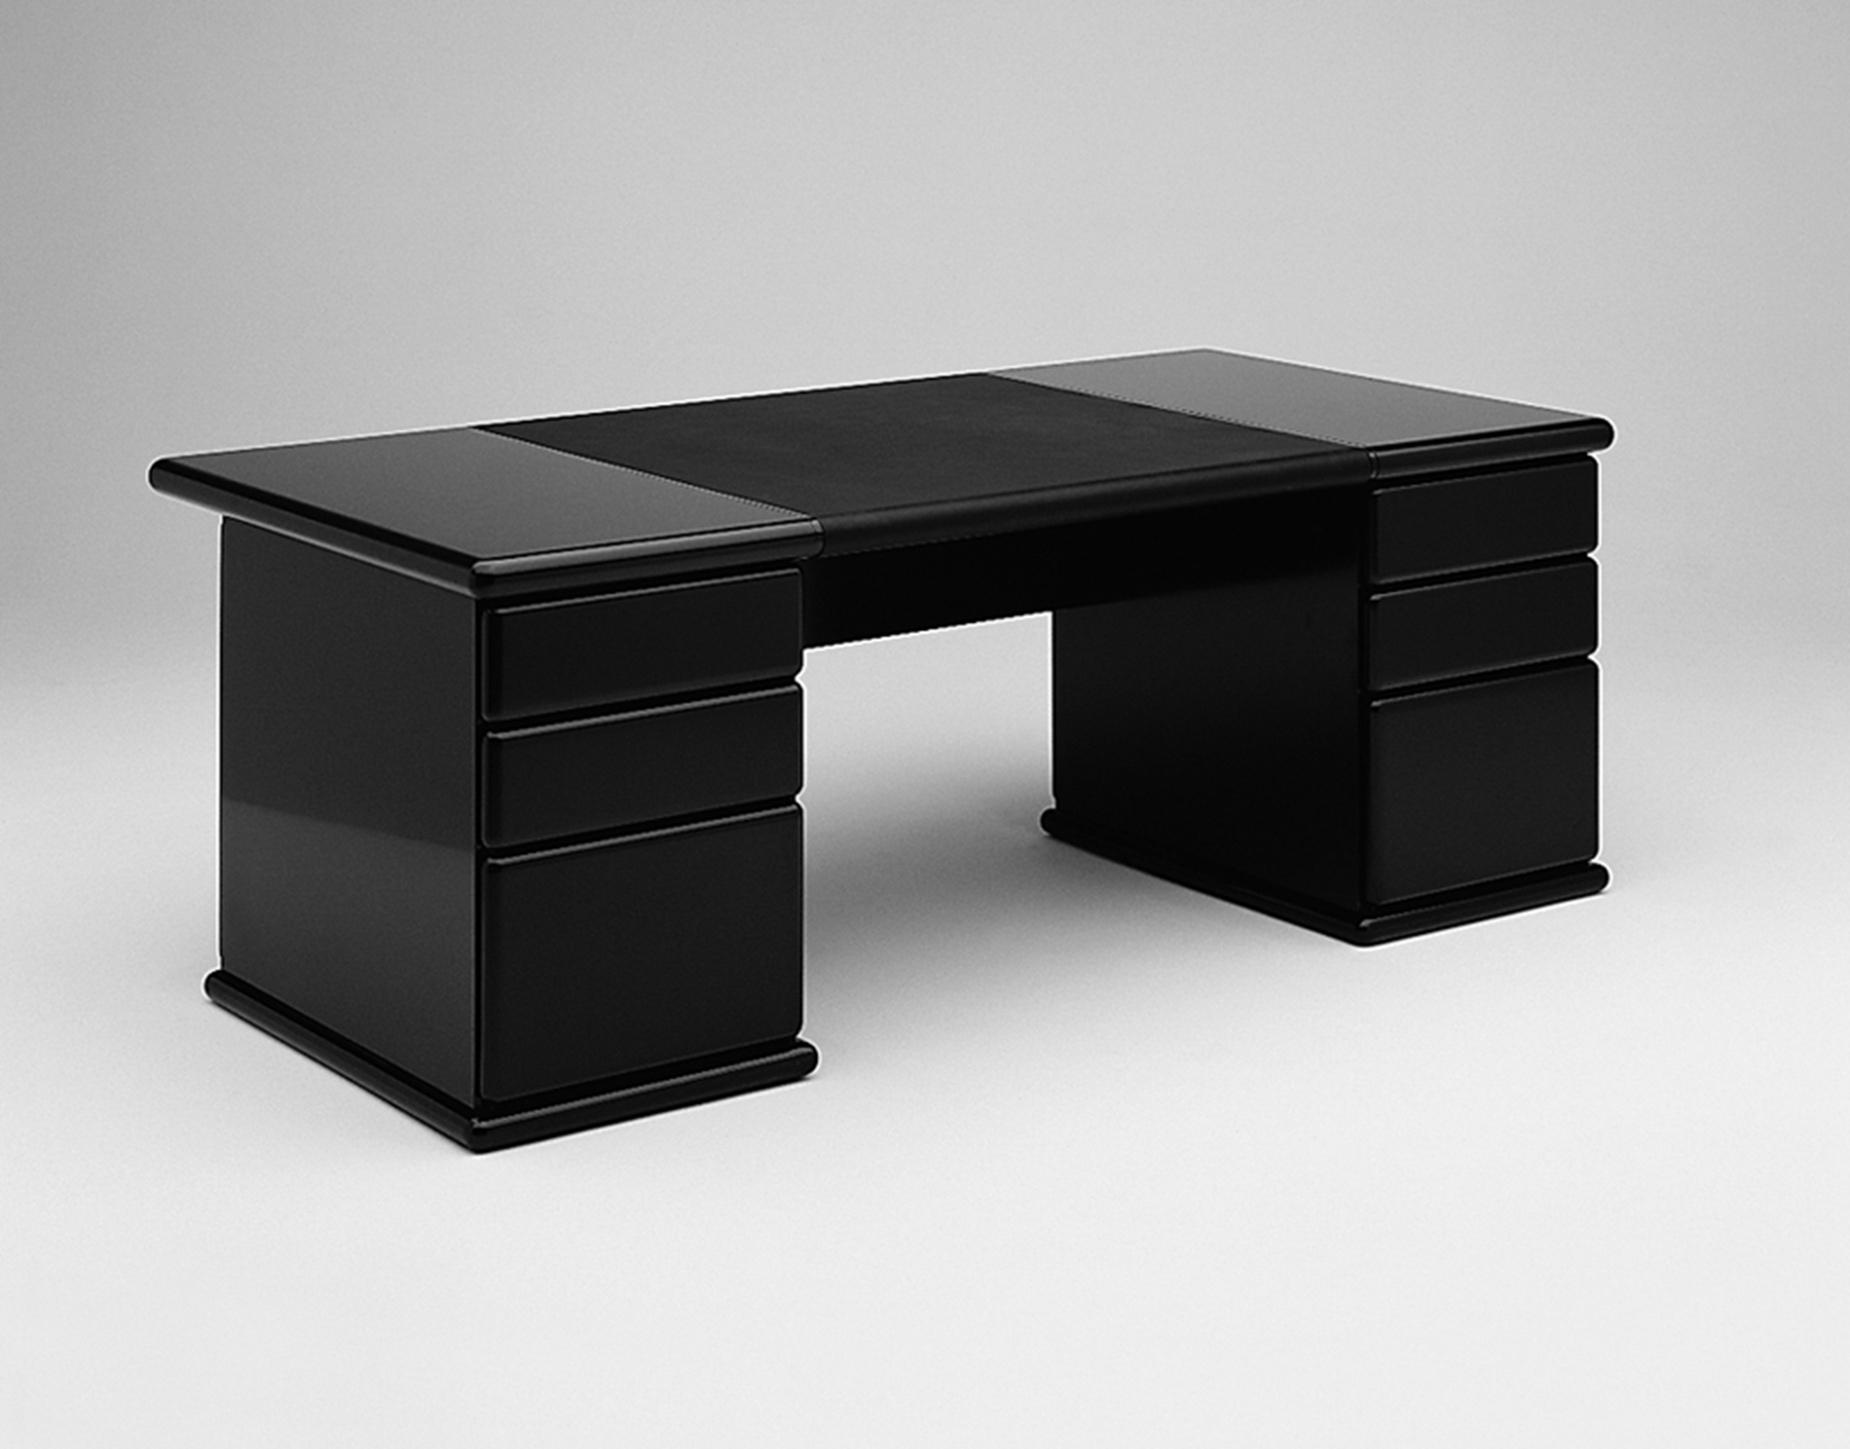 Neo Old School Black Retro Double Pedestal Desk for Executive home office